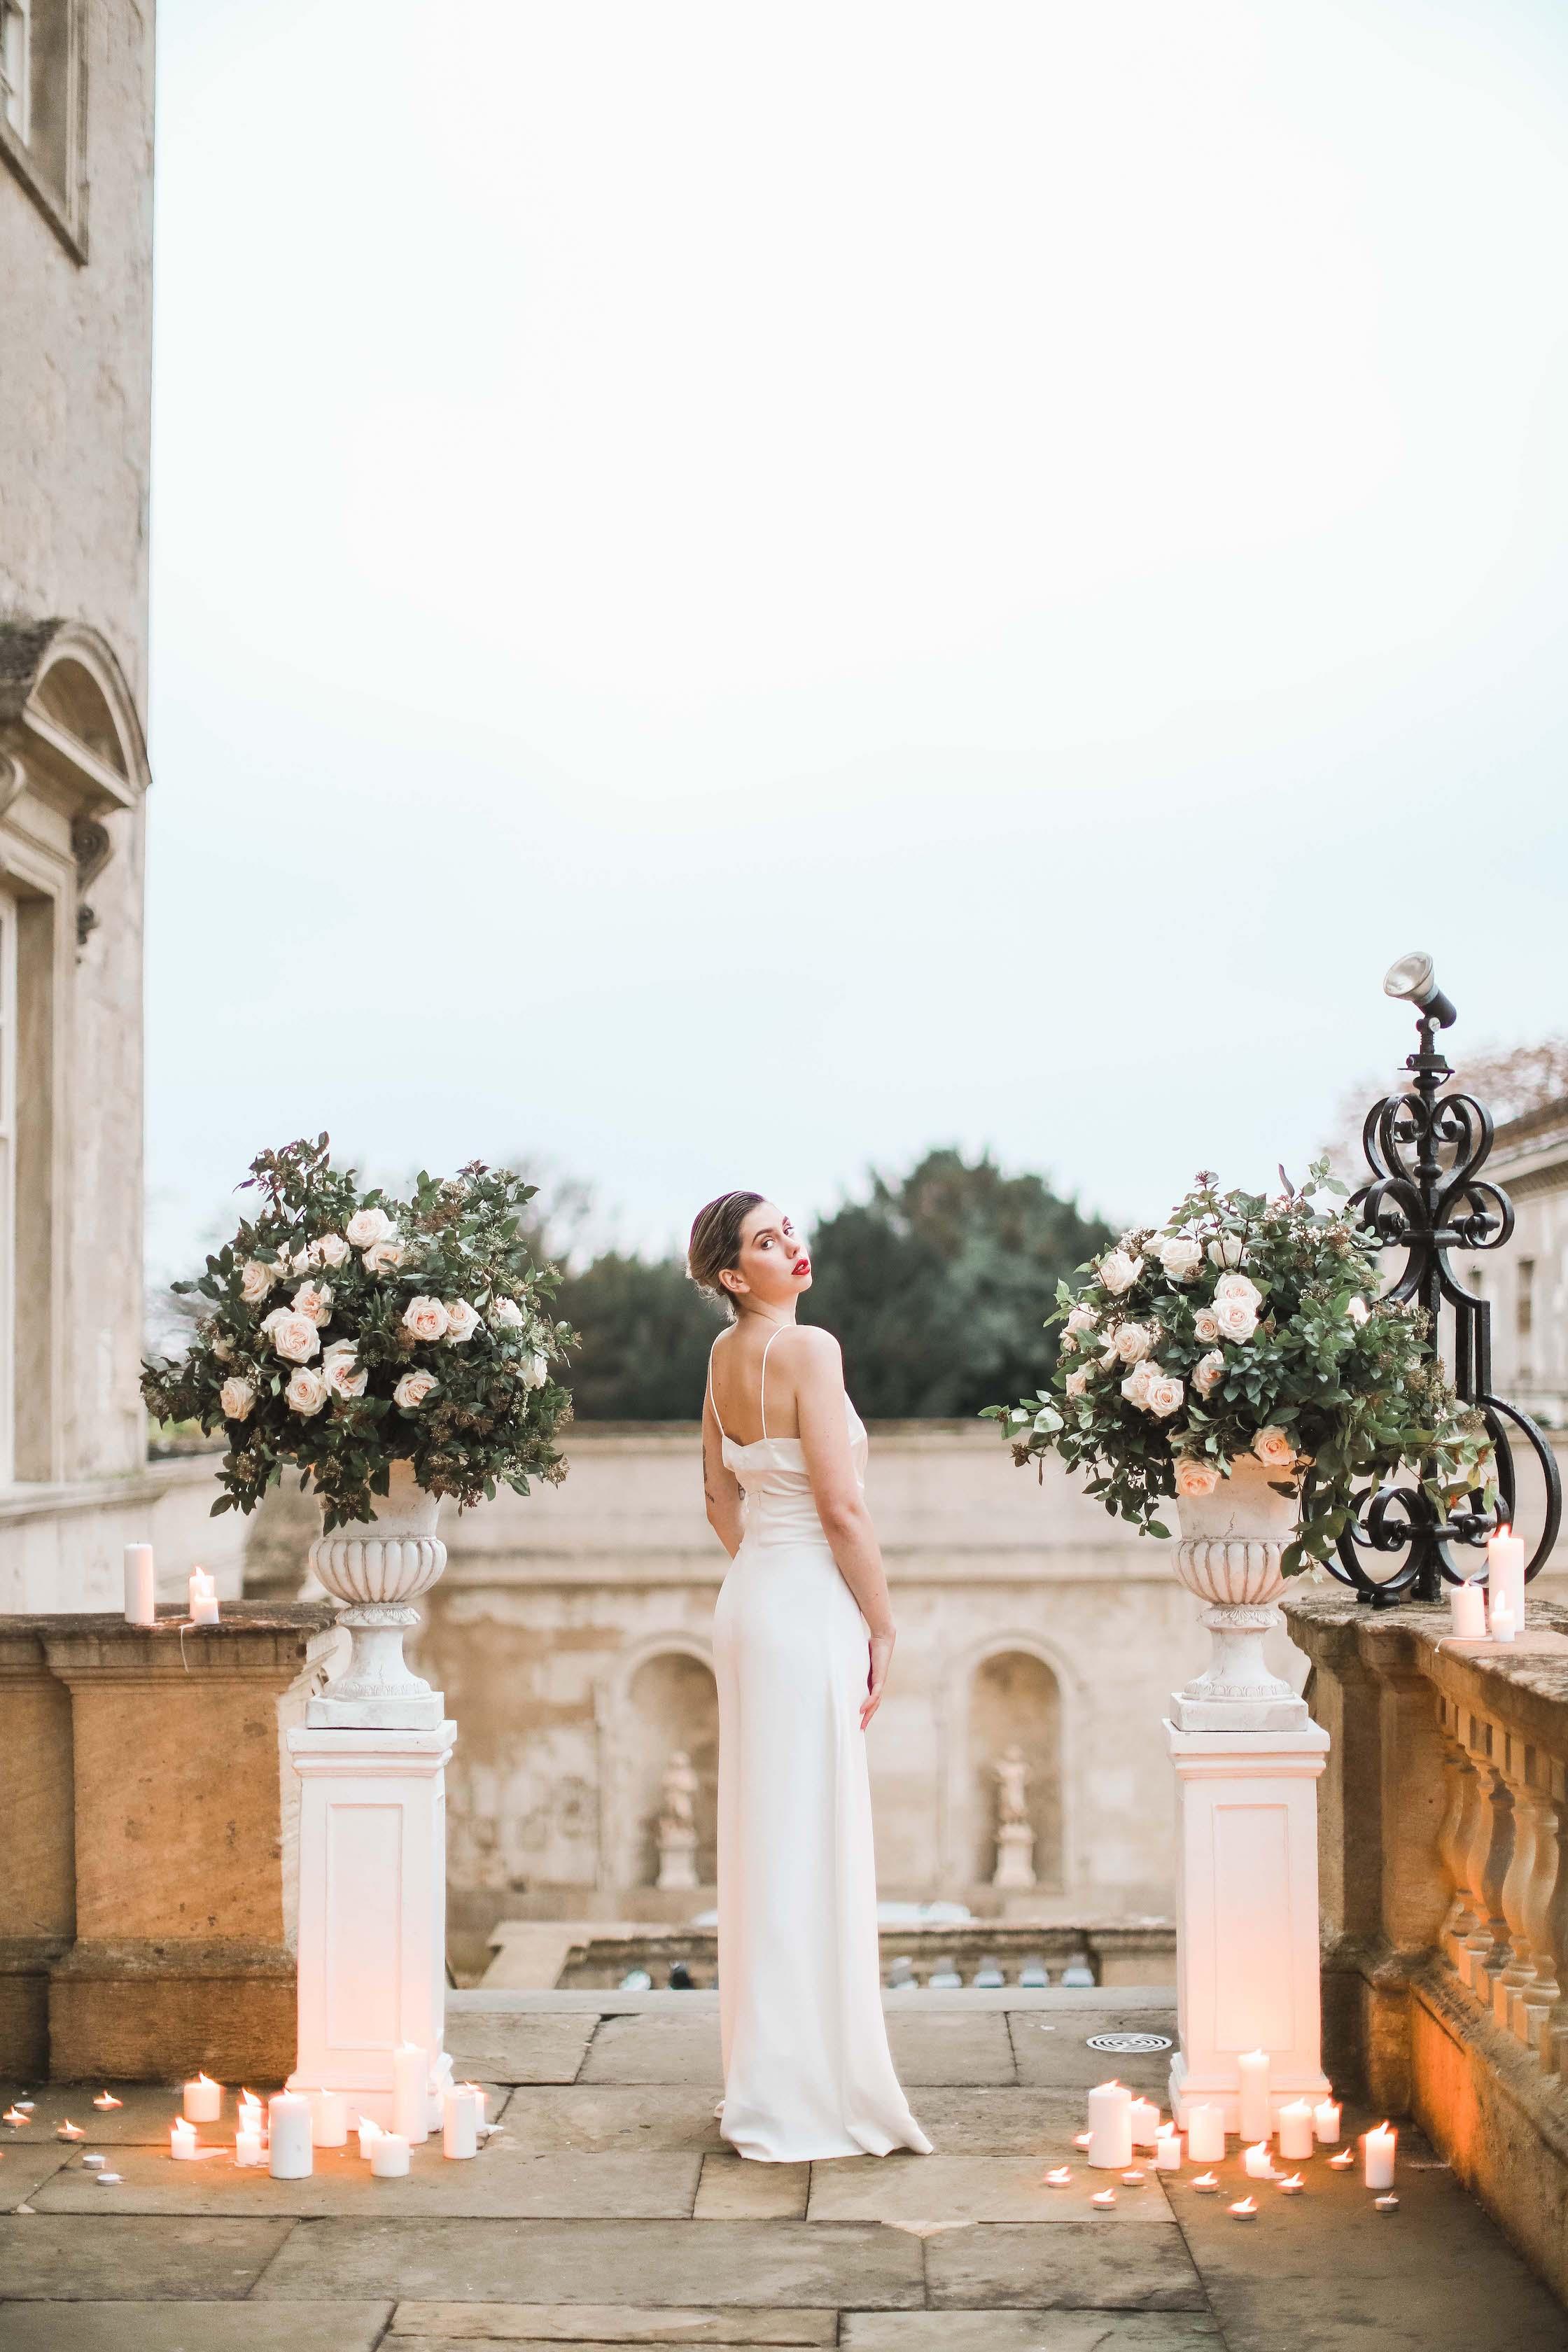 Evening Dress - Evening Wedding Flowers - Candle Decorations